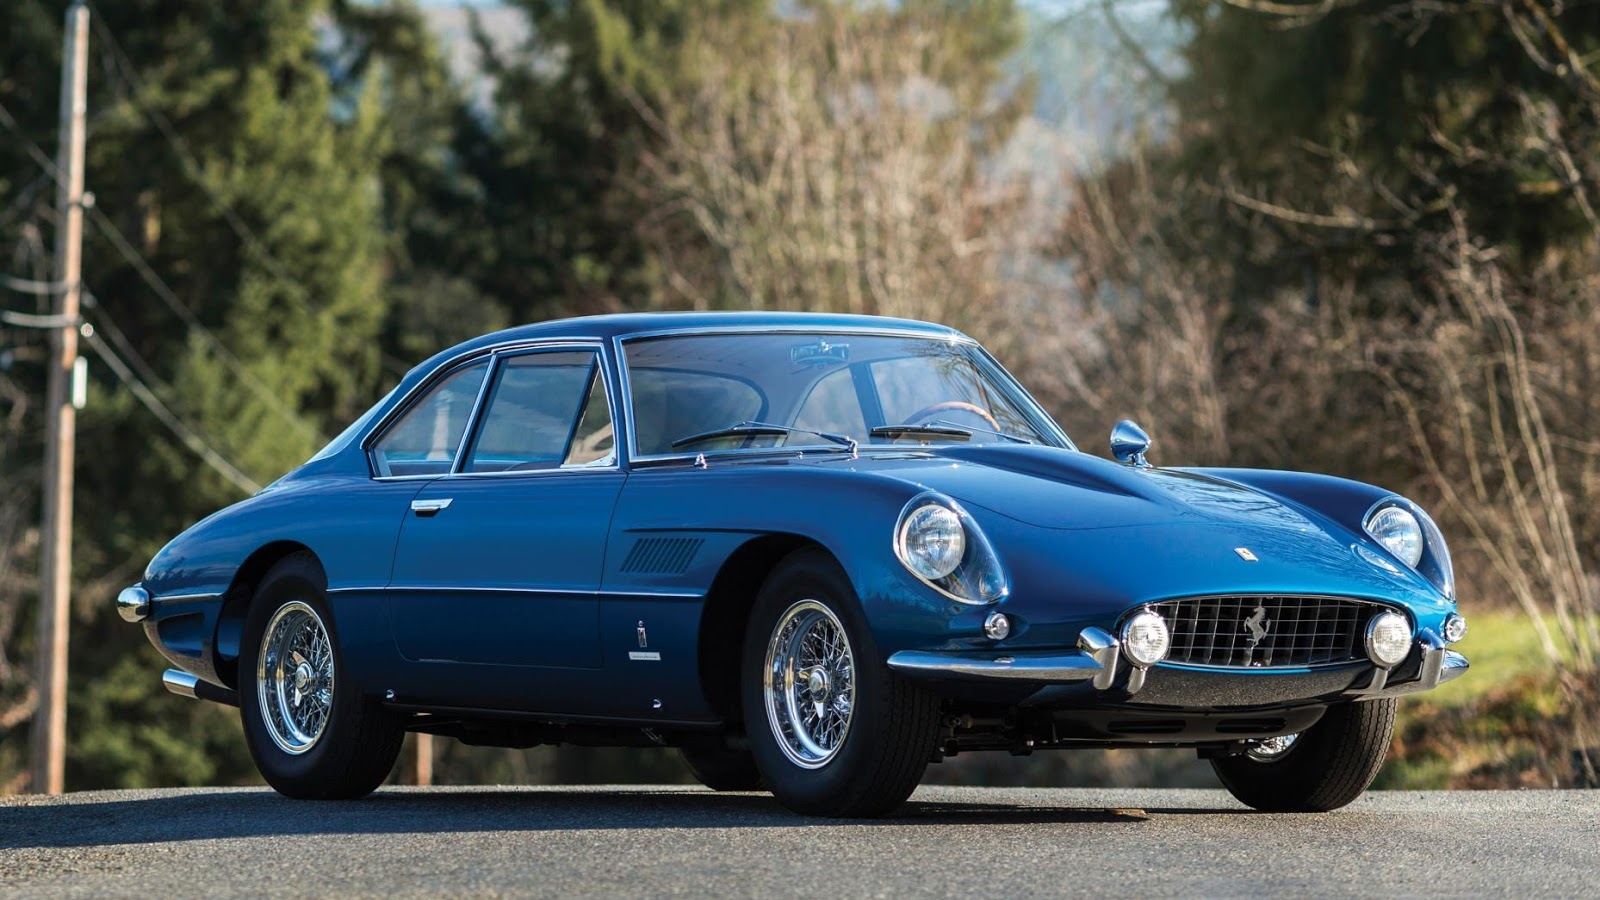 1962 Ferrari 400 Superamerica LWB Coupe Aerodinamico: $4,400,000